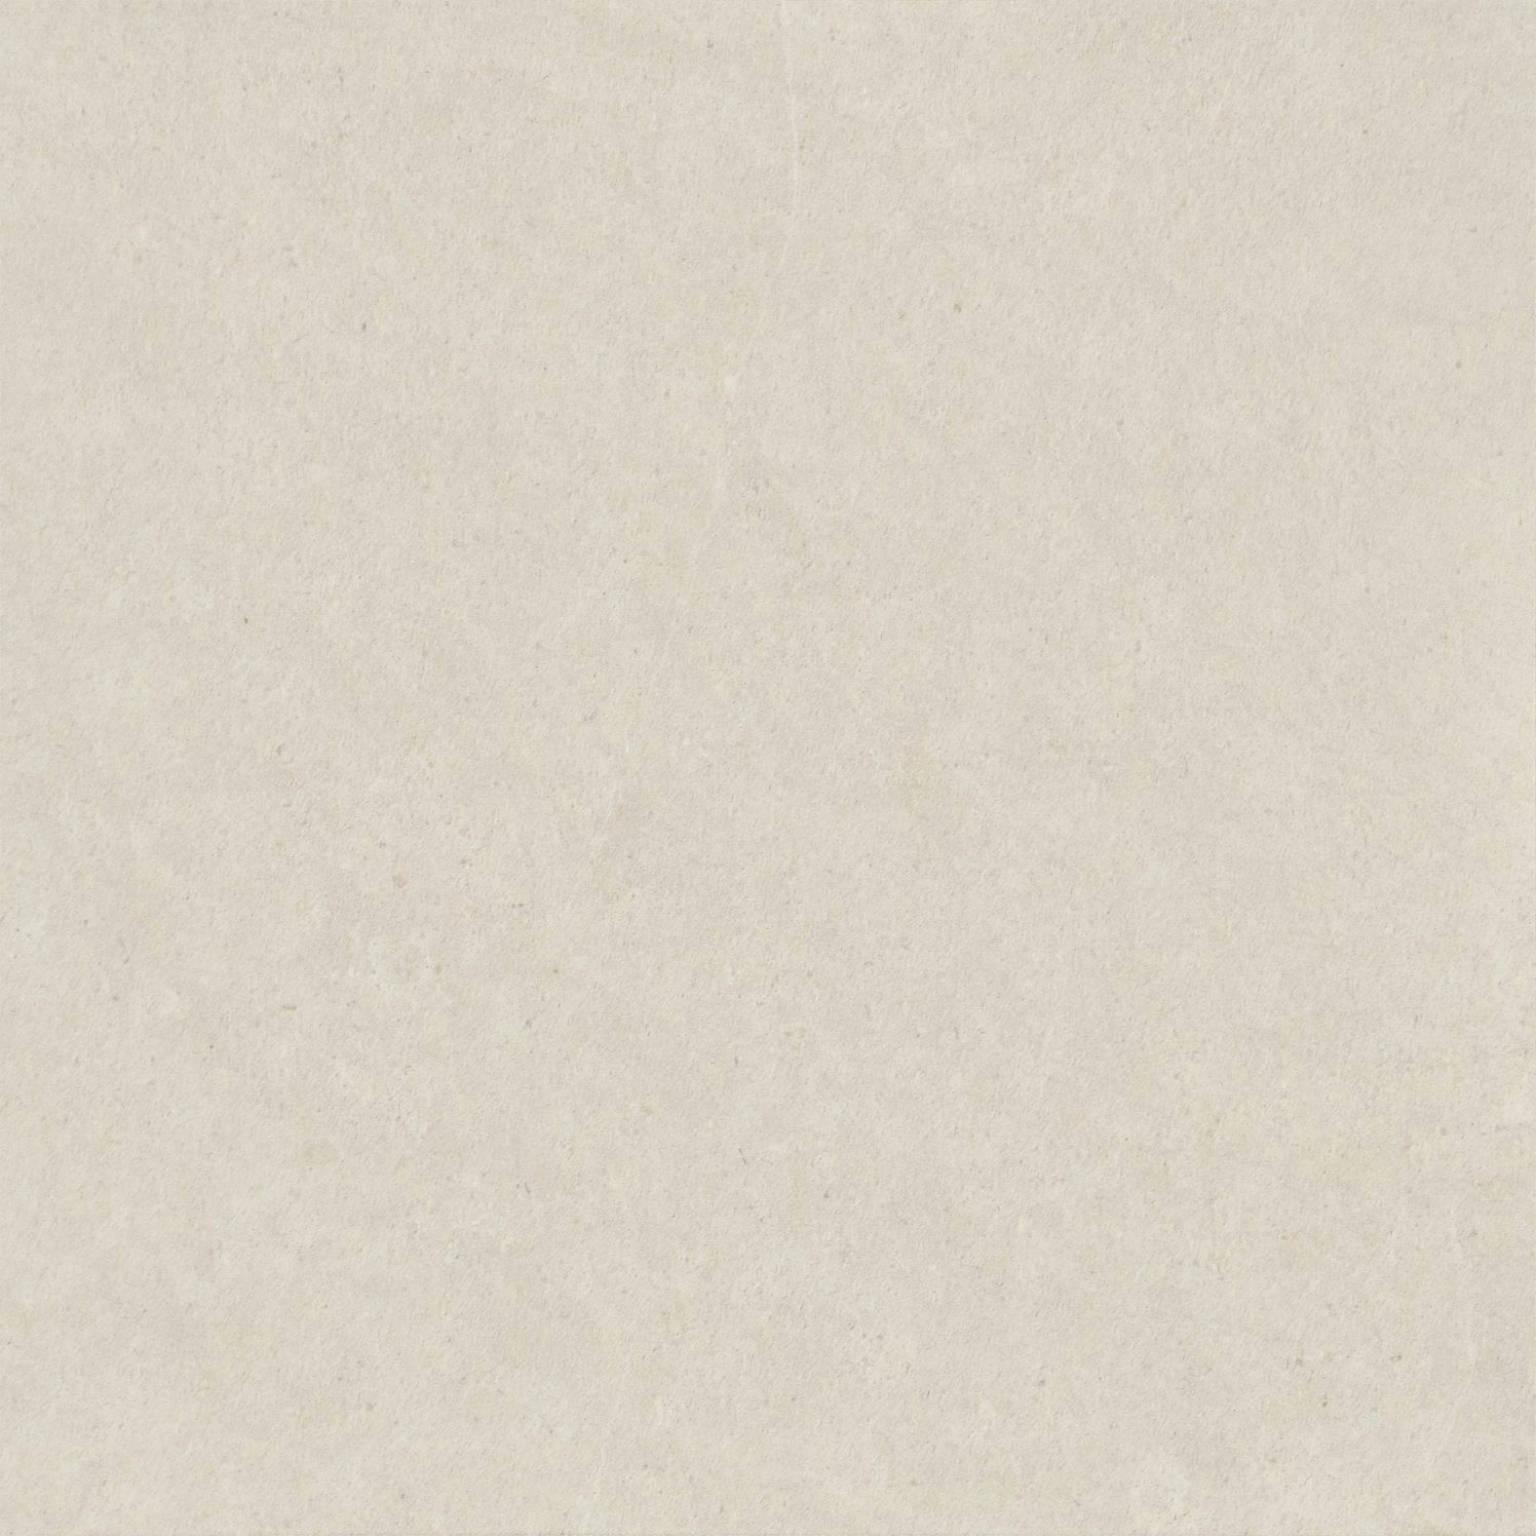 Qstone Ivory 60x60 | Newker